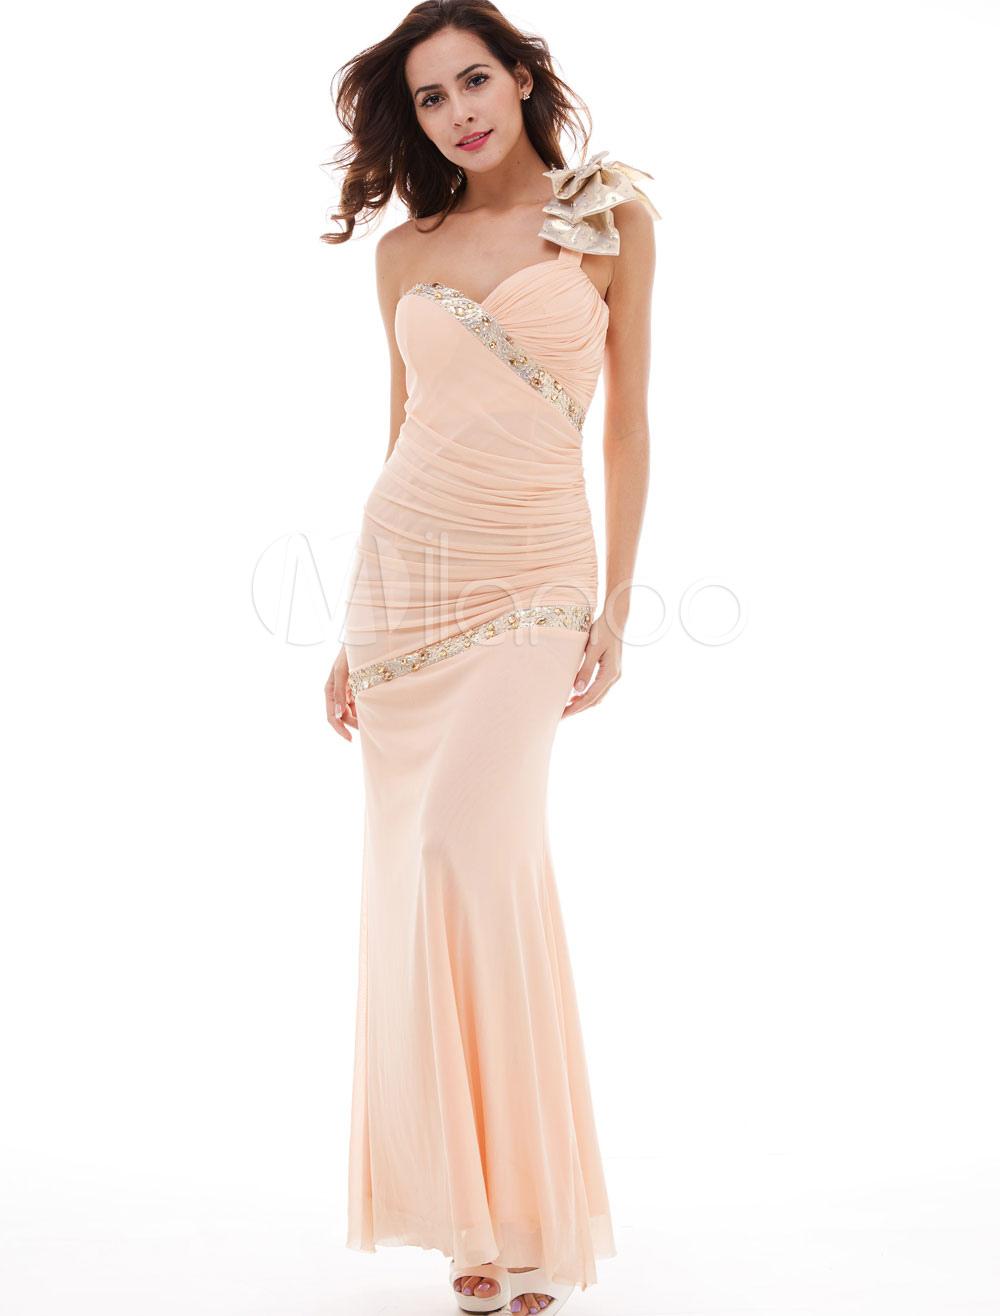 Mermaid Evening Dresses Formal One Shoulder Bows Beading Peach Ruched Long Chiffon Prom Dress (Wedding Prom Dresses) photo